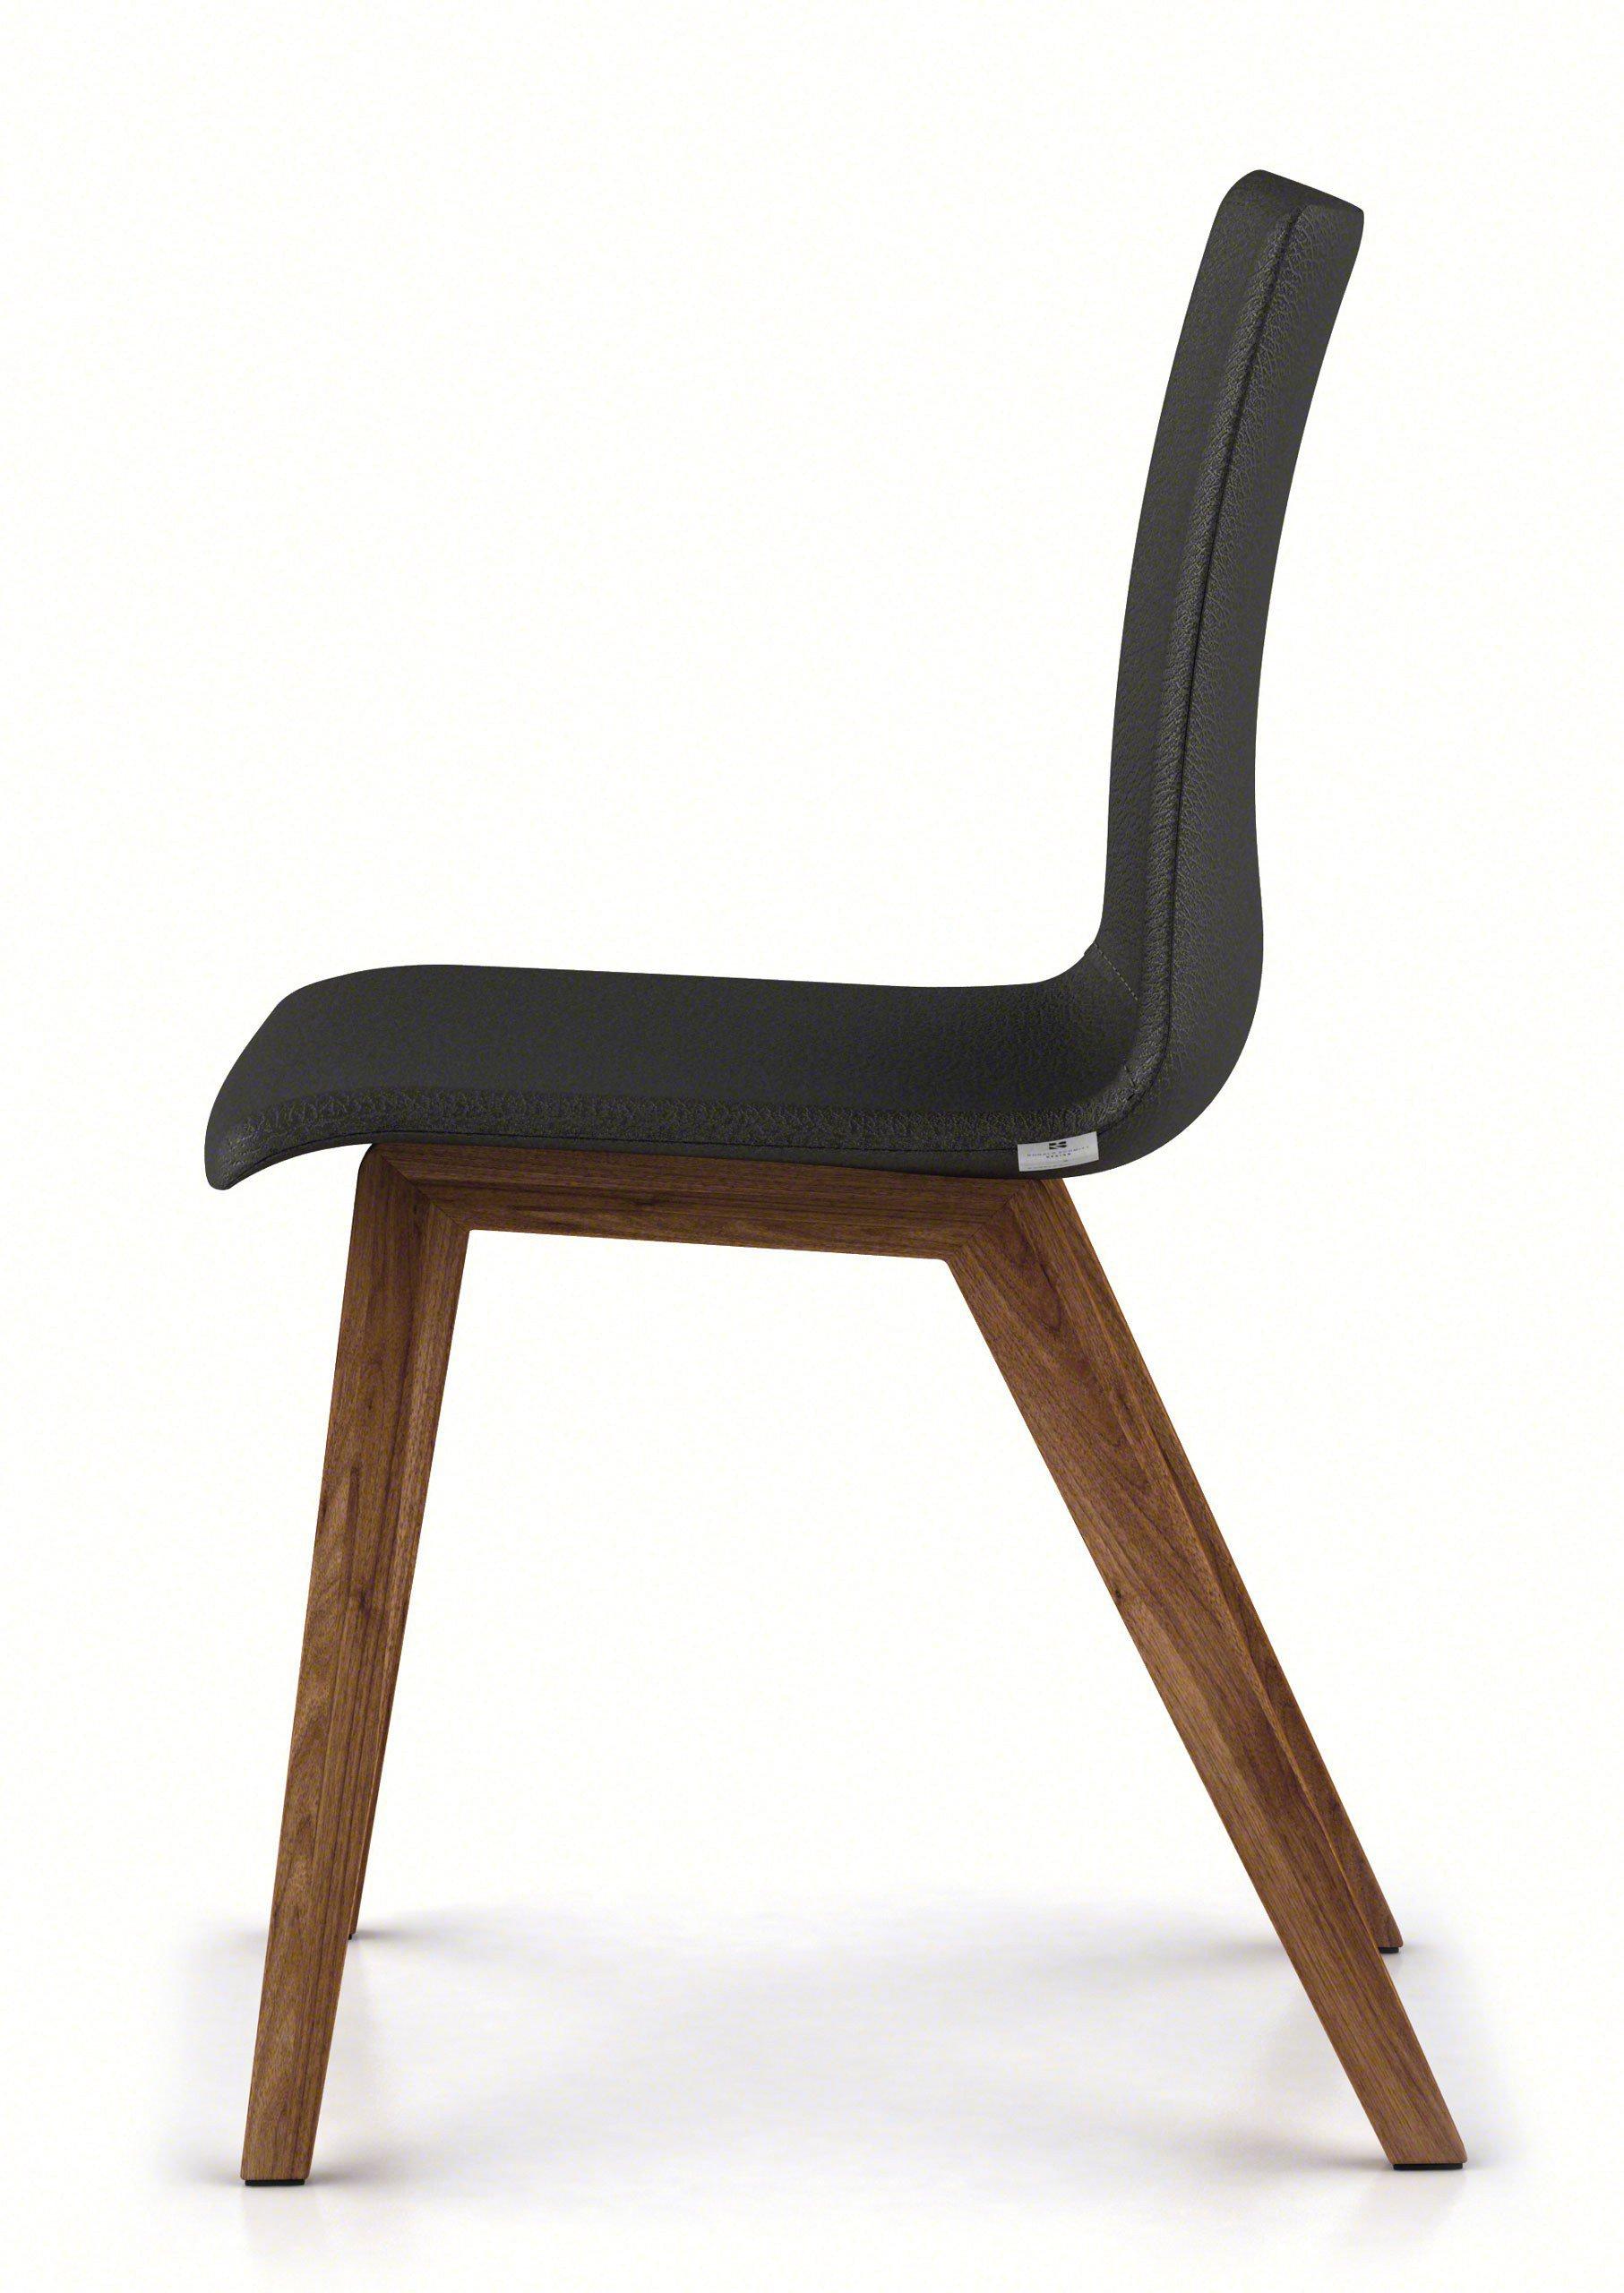 ronald schmitt tetra rst 65 stuhl nussbaum leder. Black Bedroom Furniture Sets. Home Design Ideas